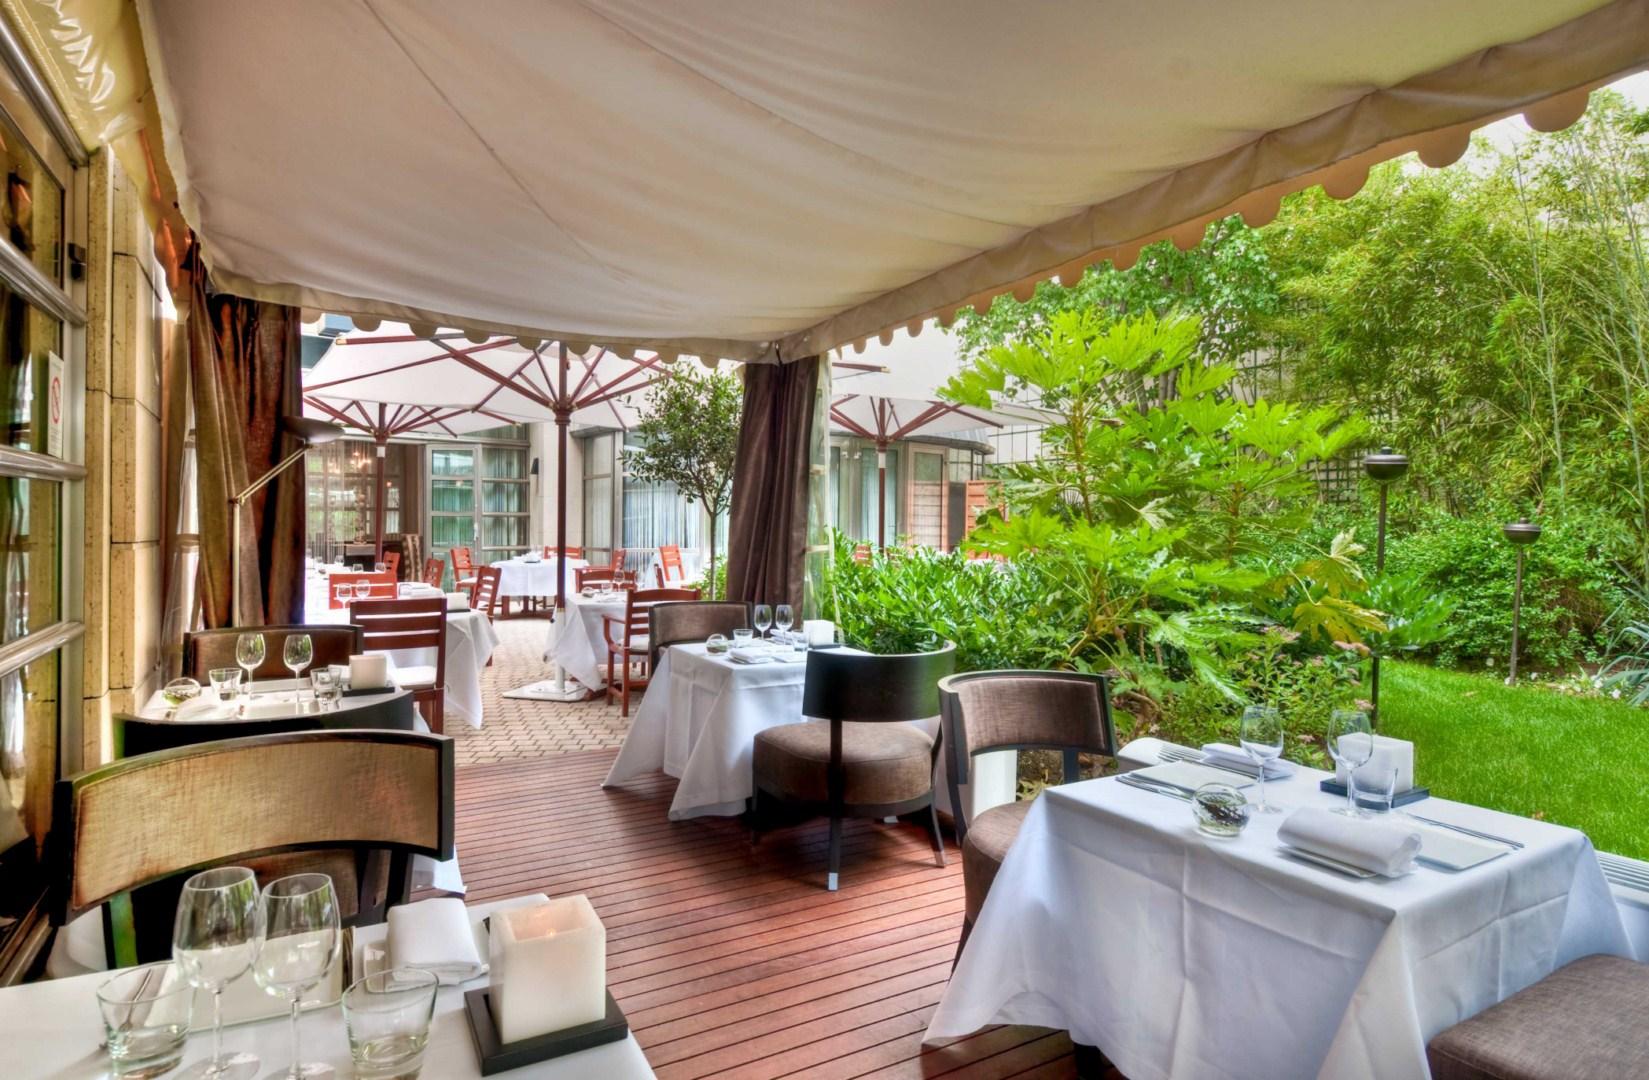 Hotel Ampere - Terrasse